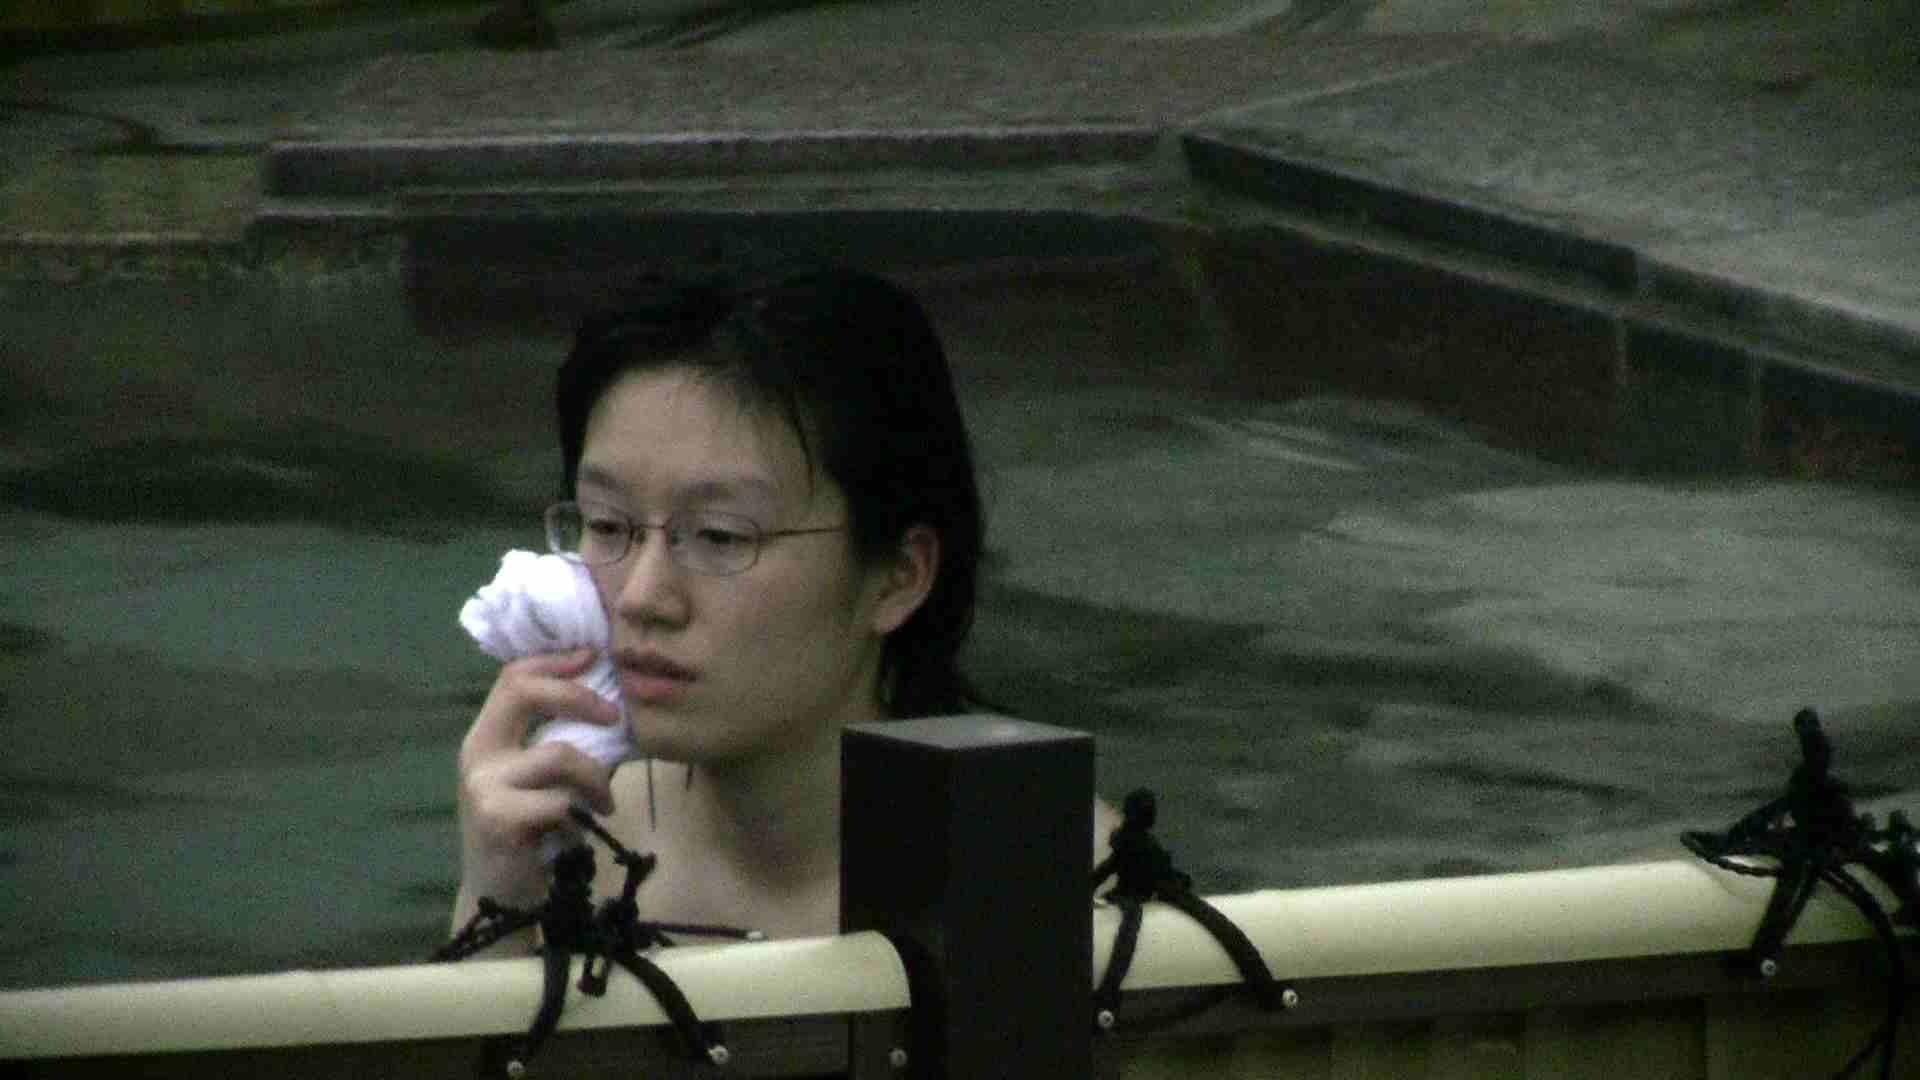 Aquaな露天風呂Vol.684 HなOL オメコ動画キャプチャ 87pic 38